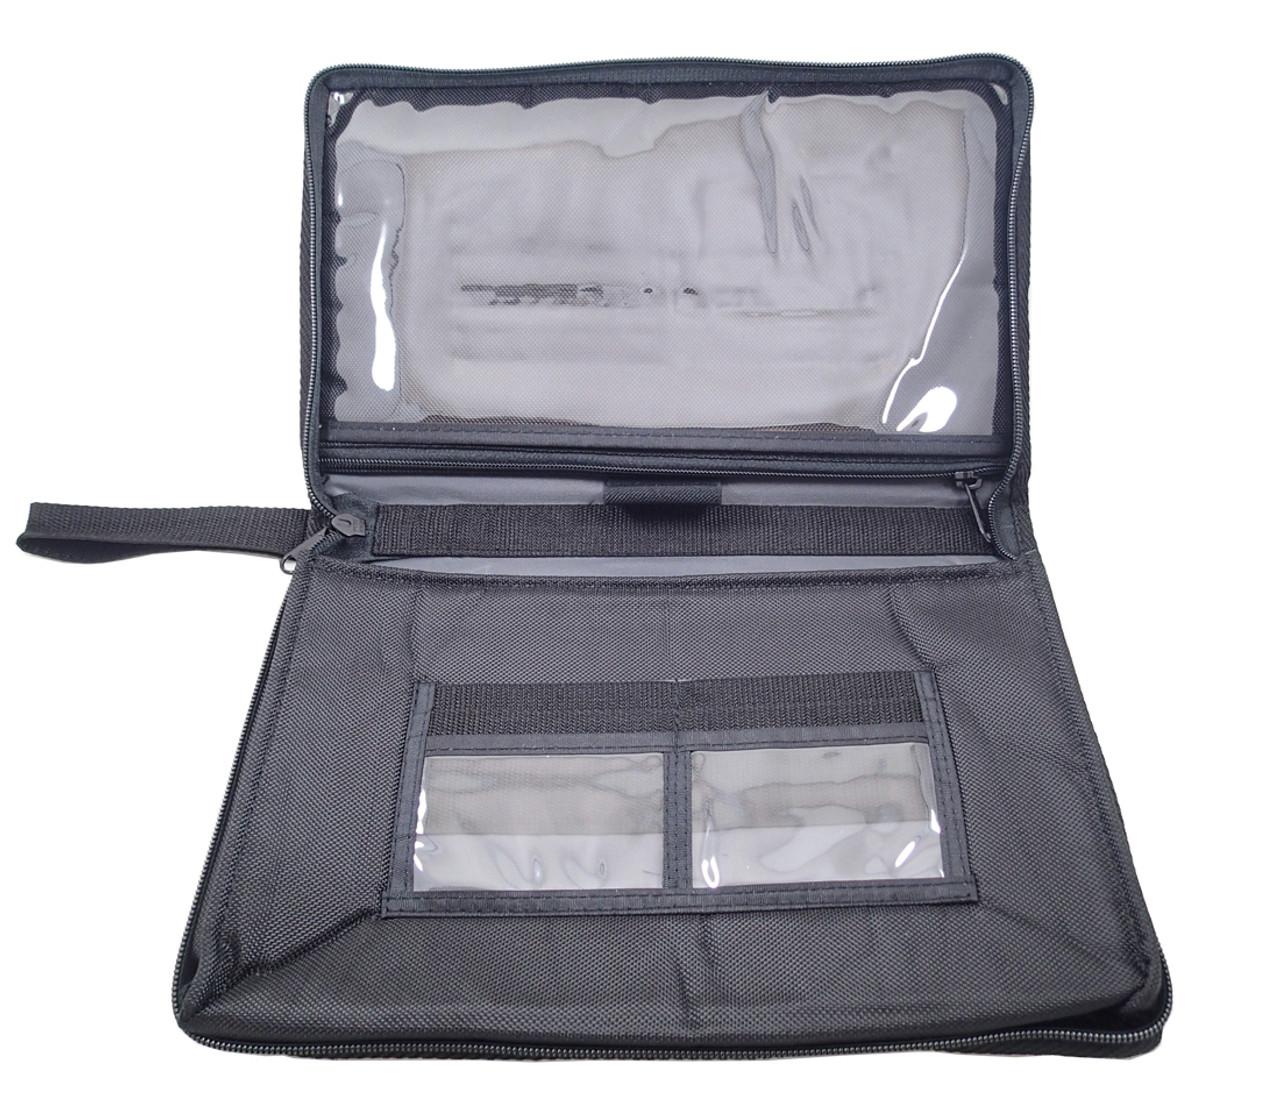 AeroPhoenix Zippered Master Logbook Case